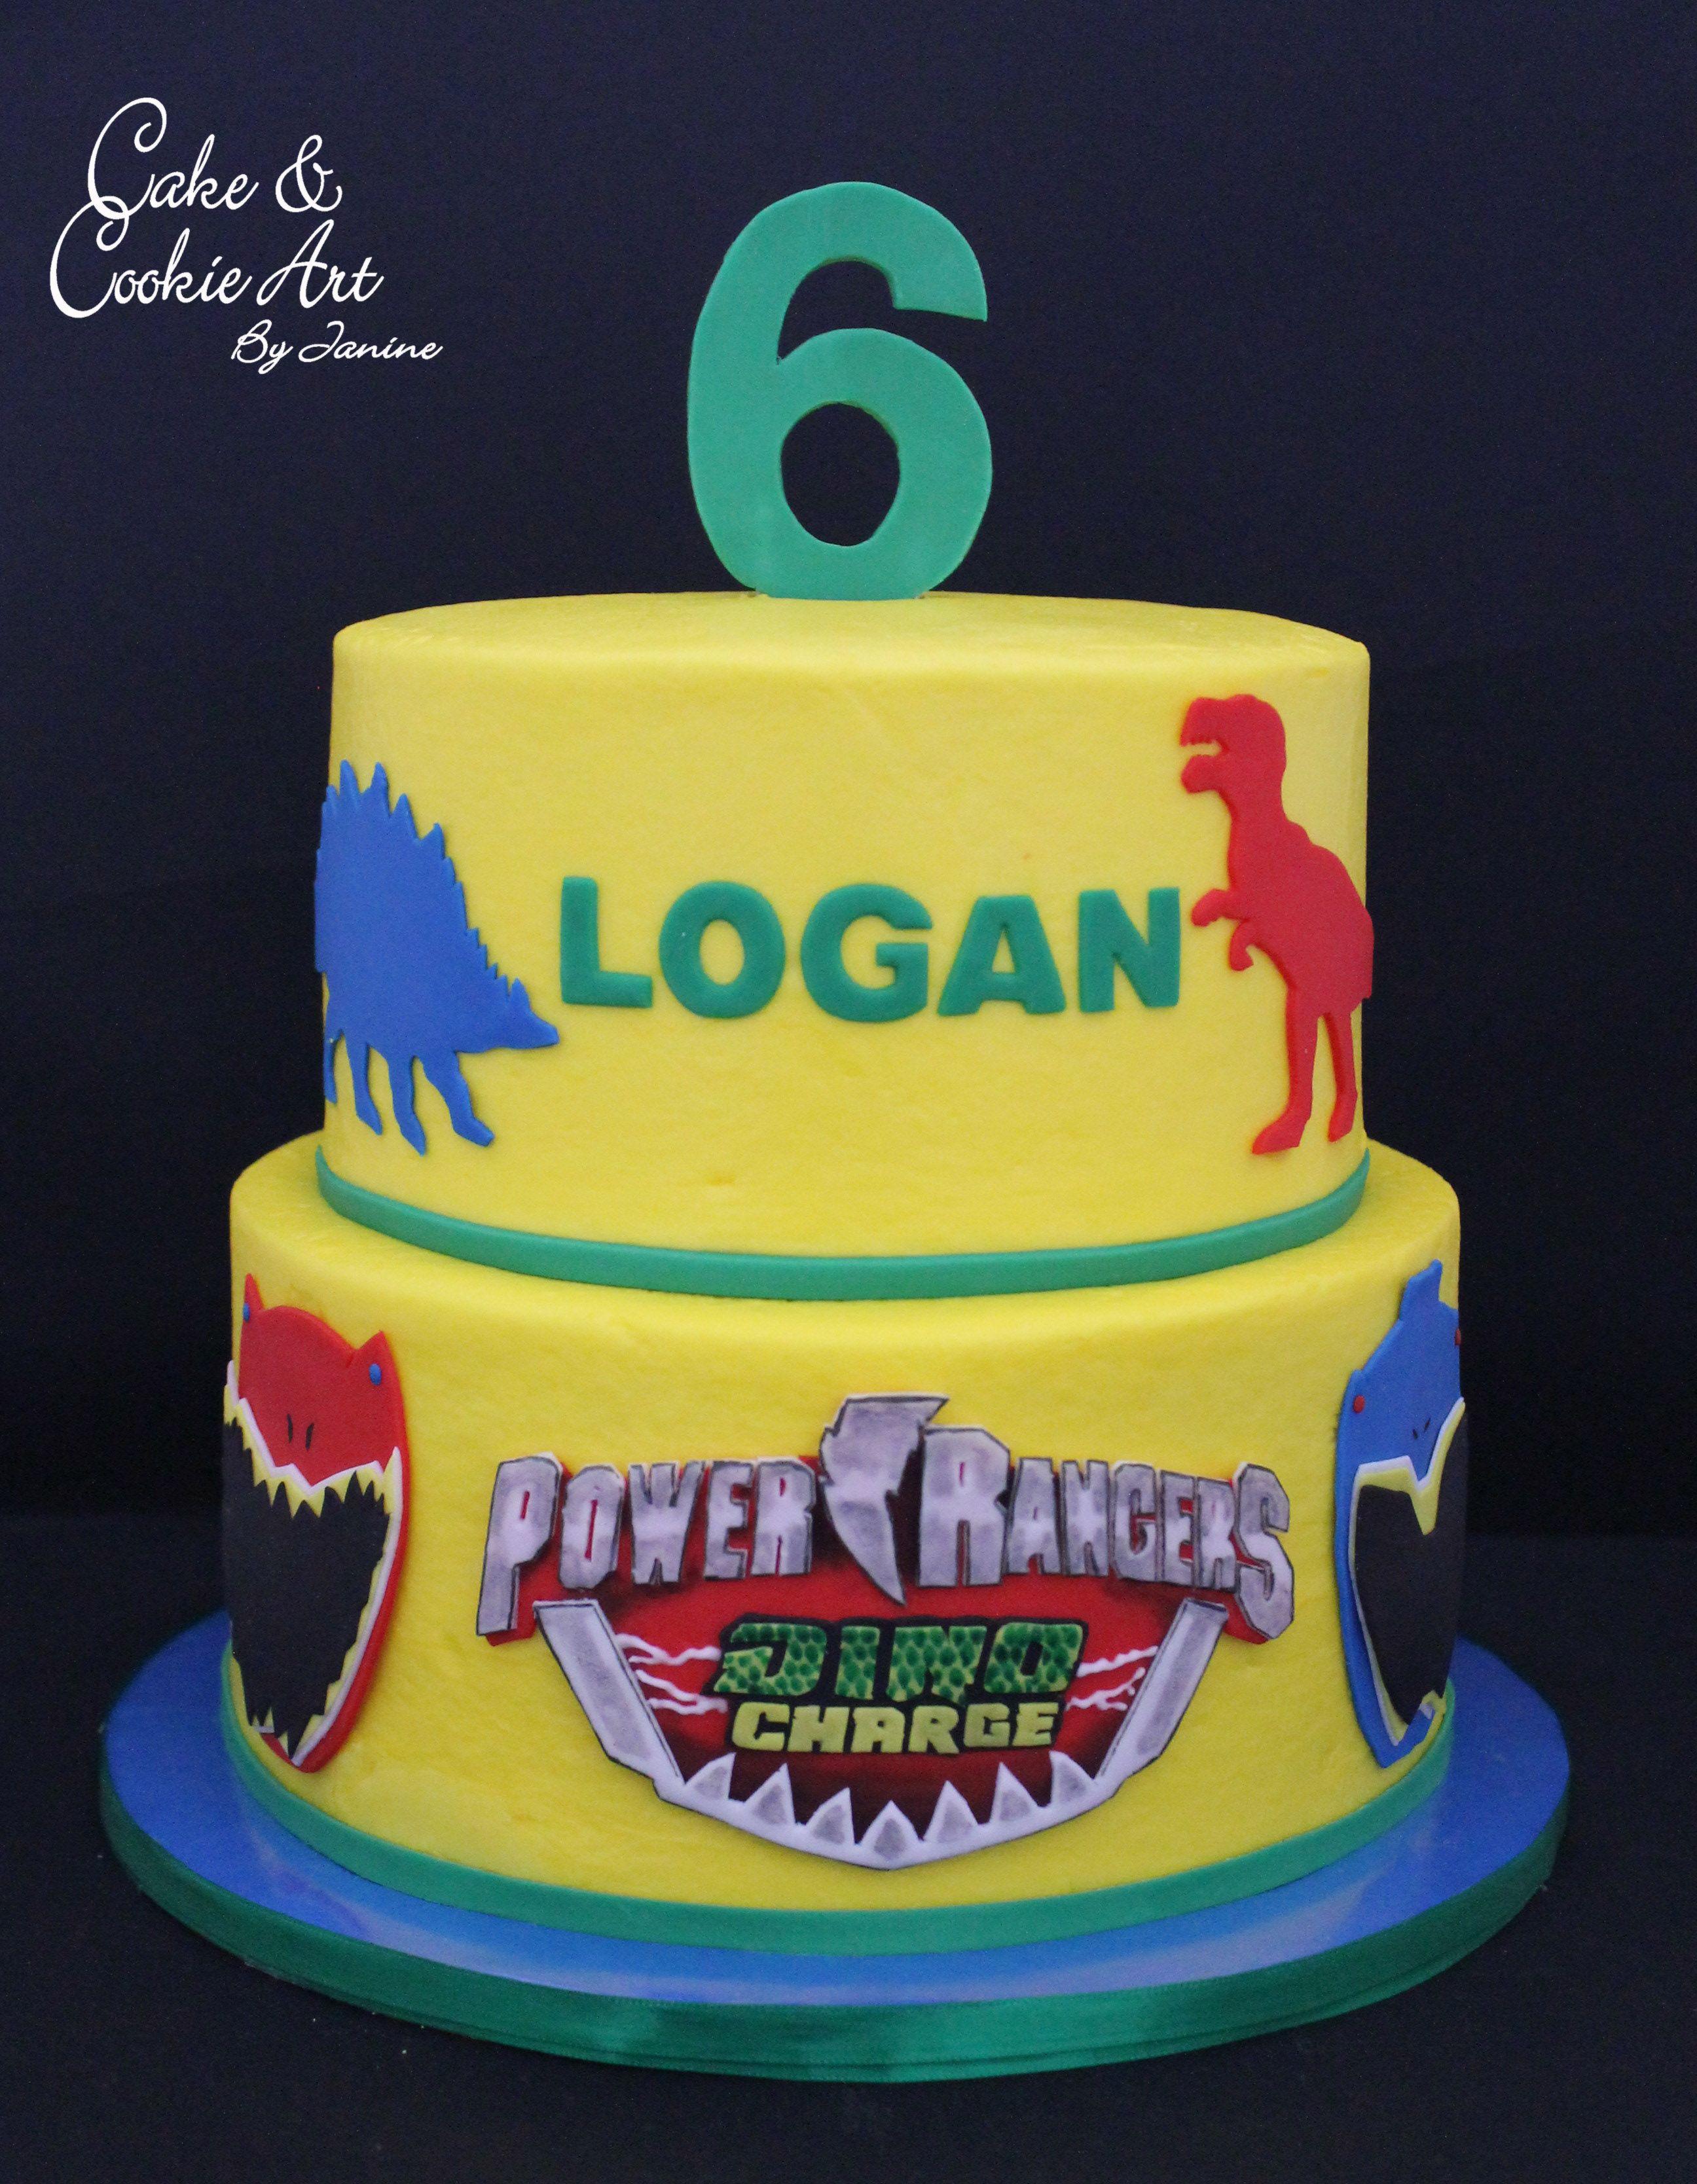 Dino Chargers Dinosaur theme cake | power rangers | Pinterest | Cake ...